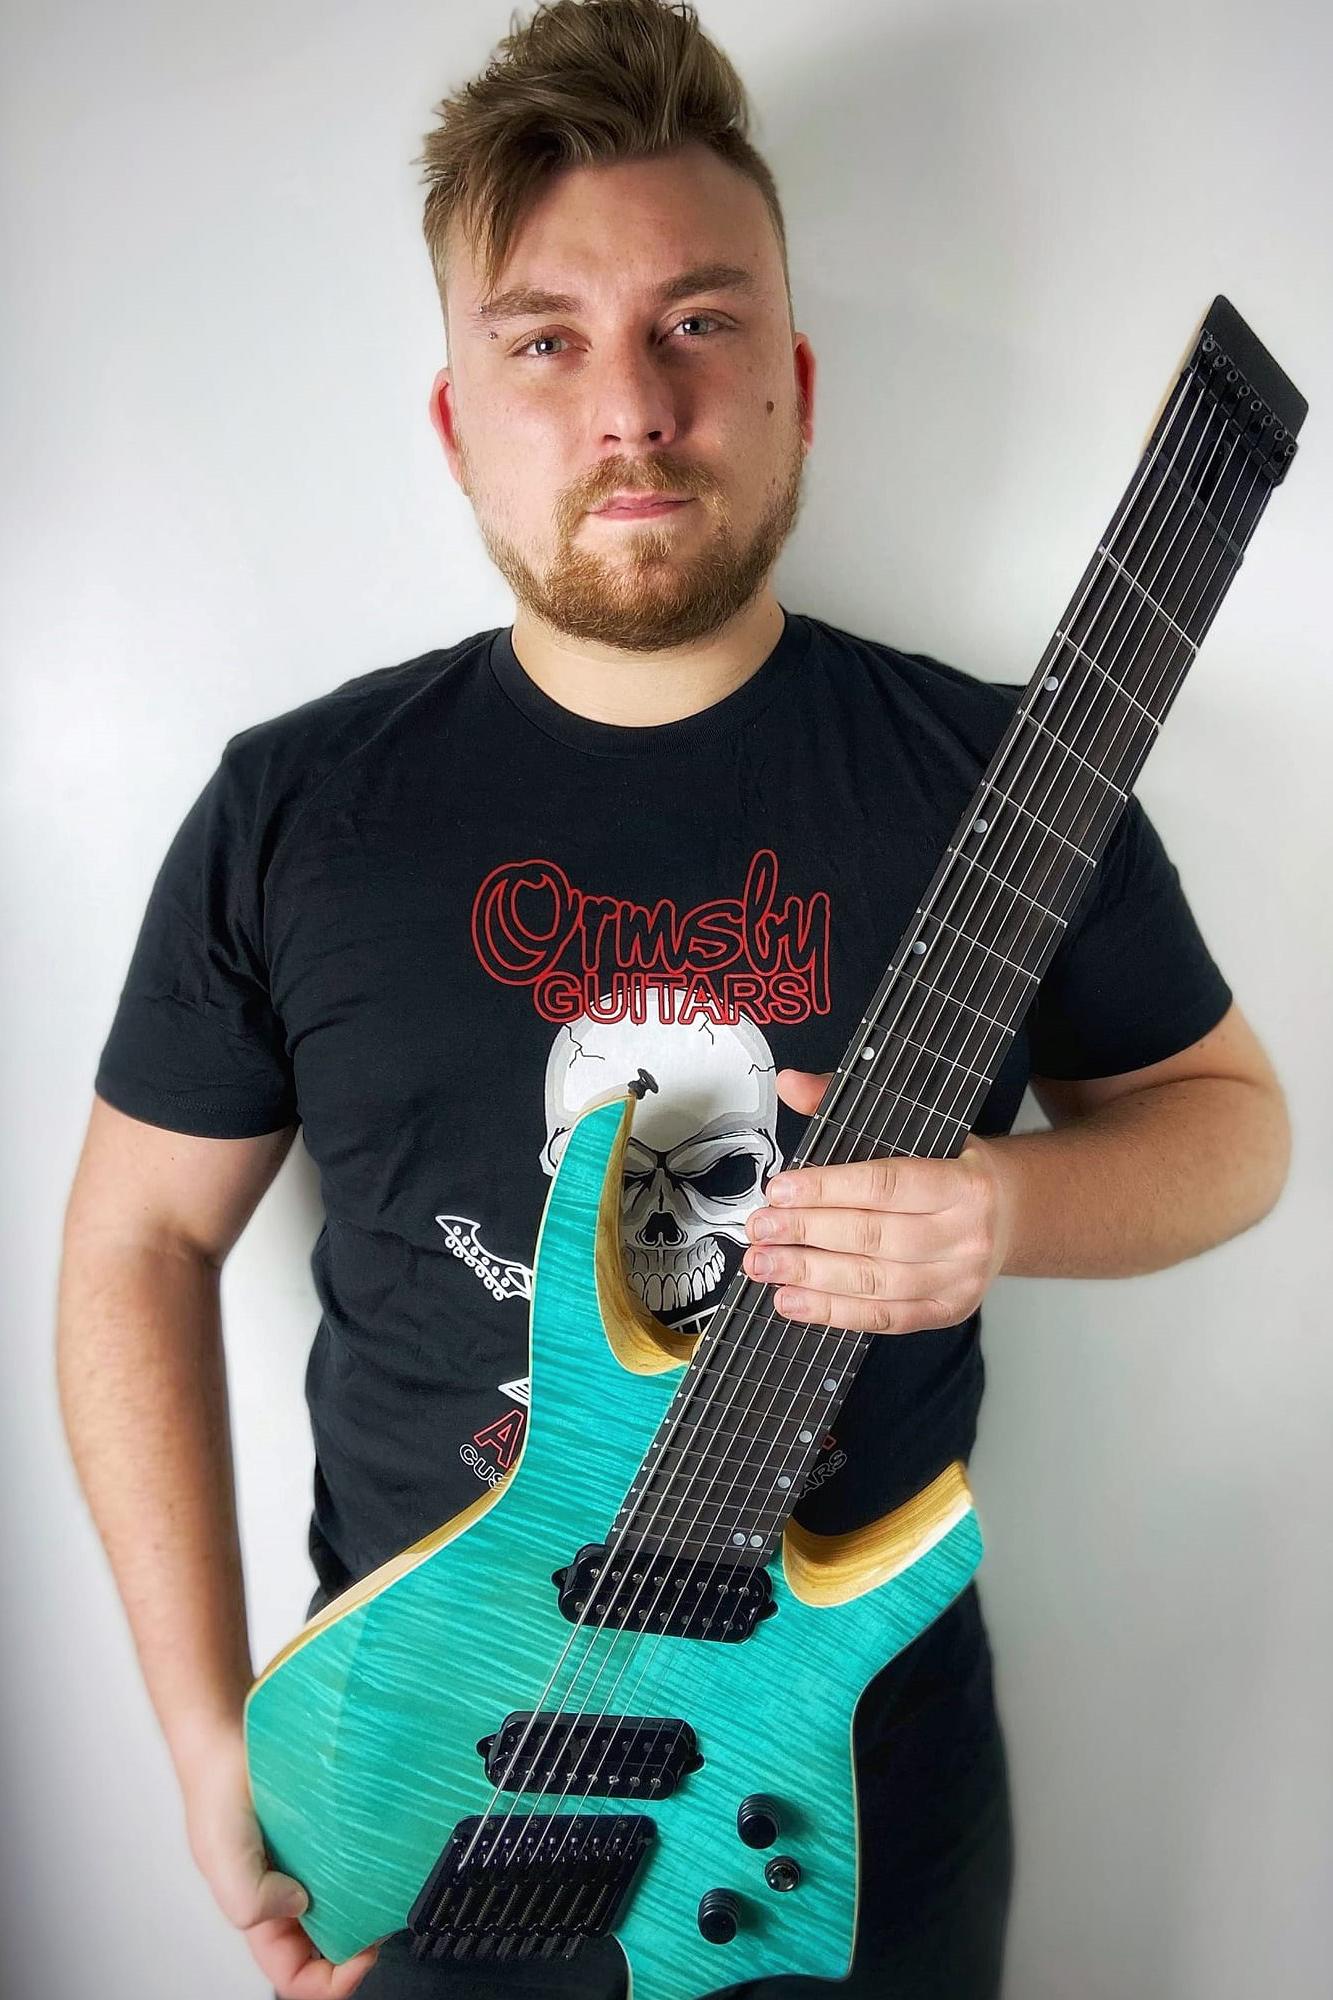 Ormsby Guitars Artists Greylotus